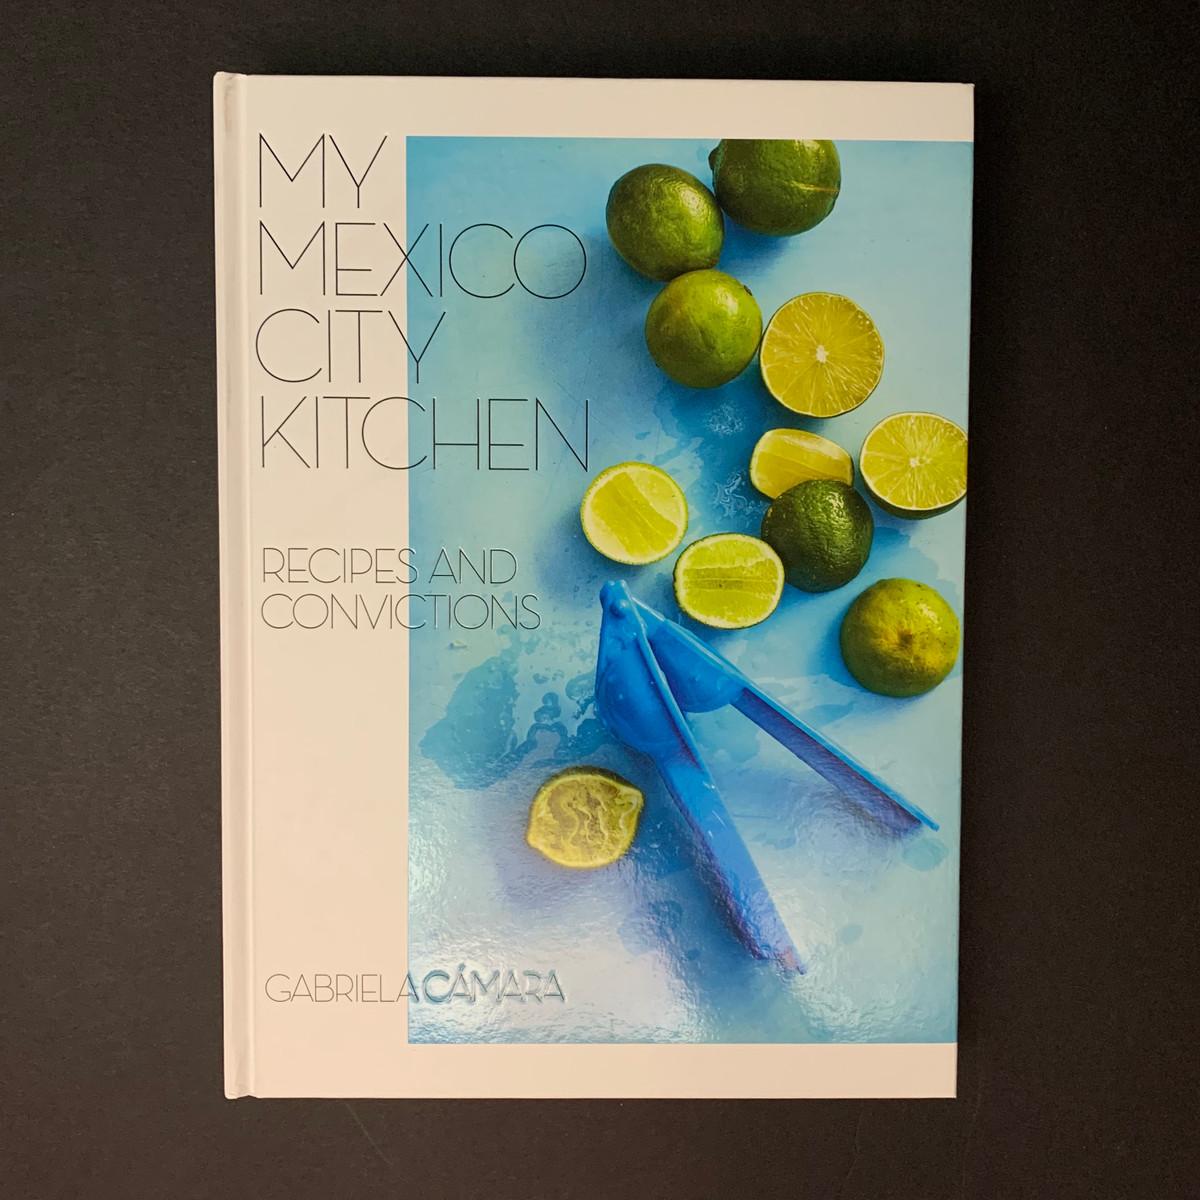 My Mexico City Kitchen   Gabriela Camara